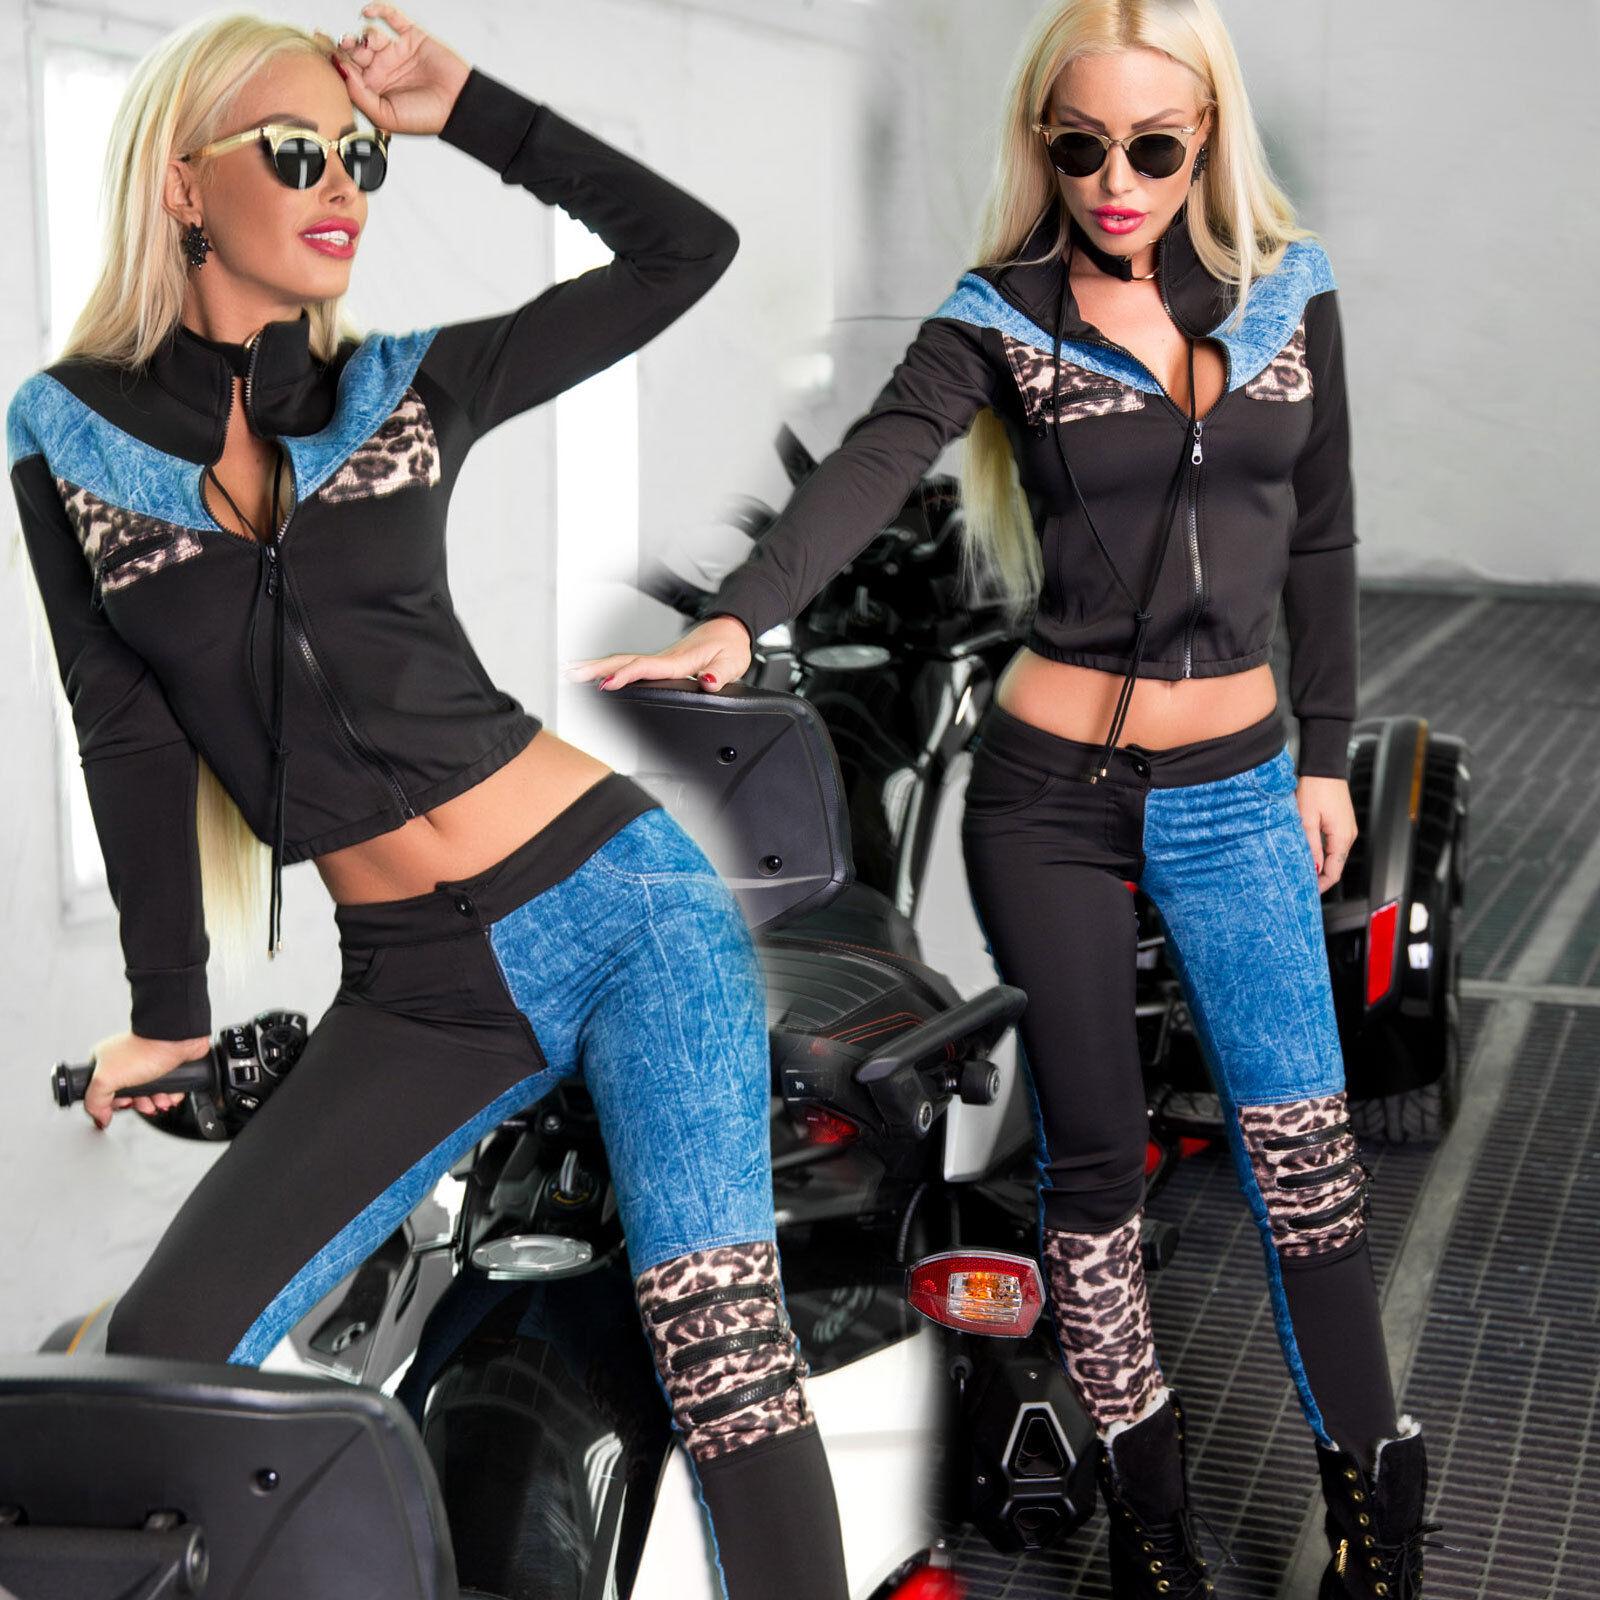 Jeans Ocassion 2-Divisorio Giacca + Hüfthose Hüfthose Hüfthose Tubi Pantaloni sericina tempo TUTA LEOPRINT XS S M d49824